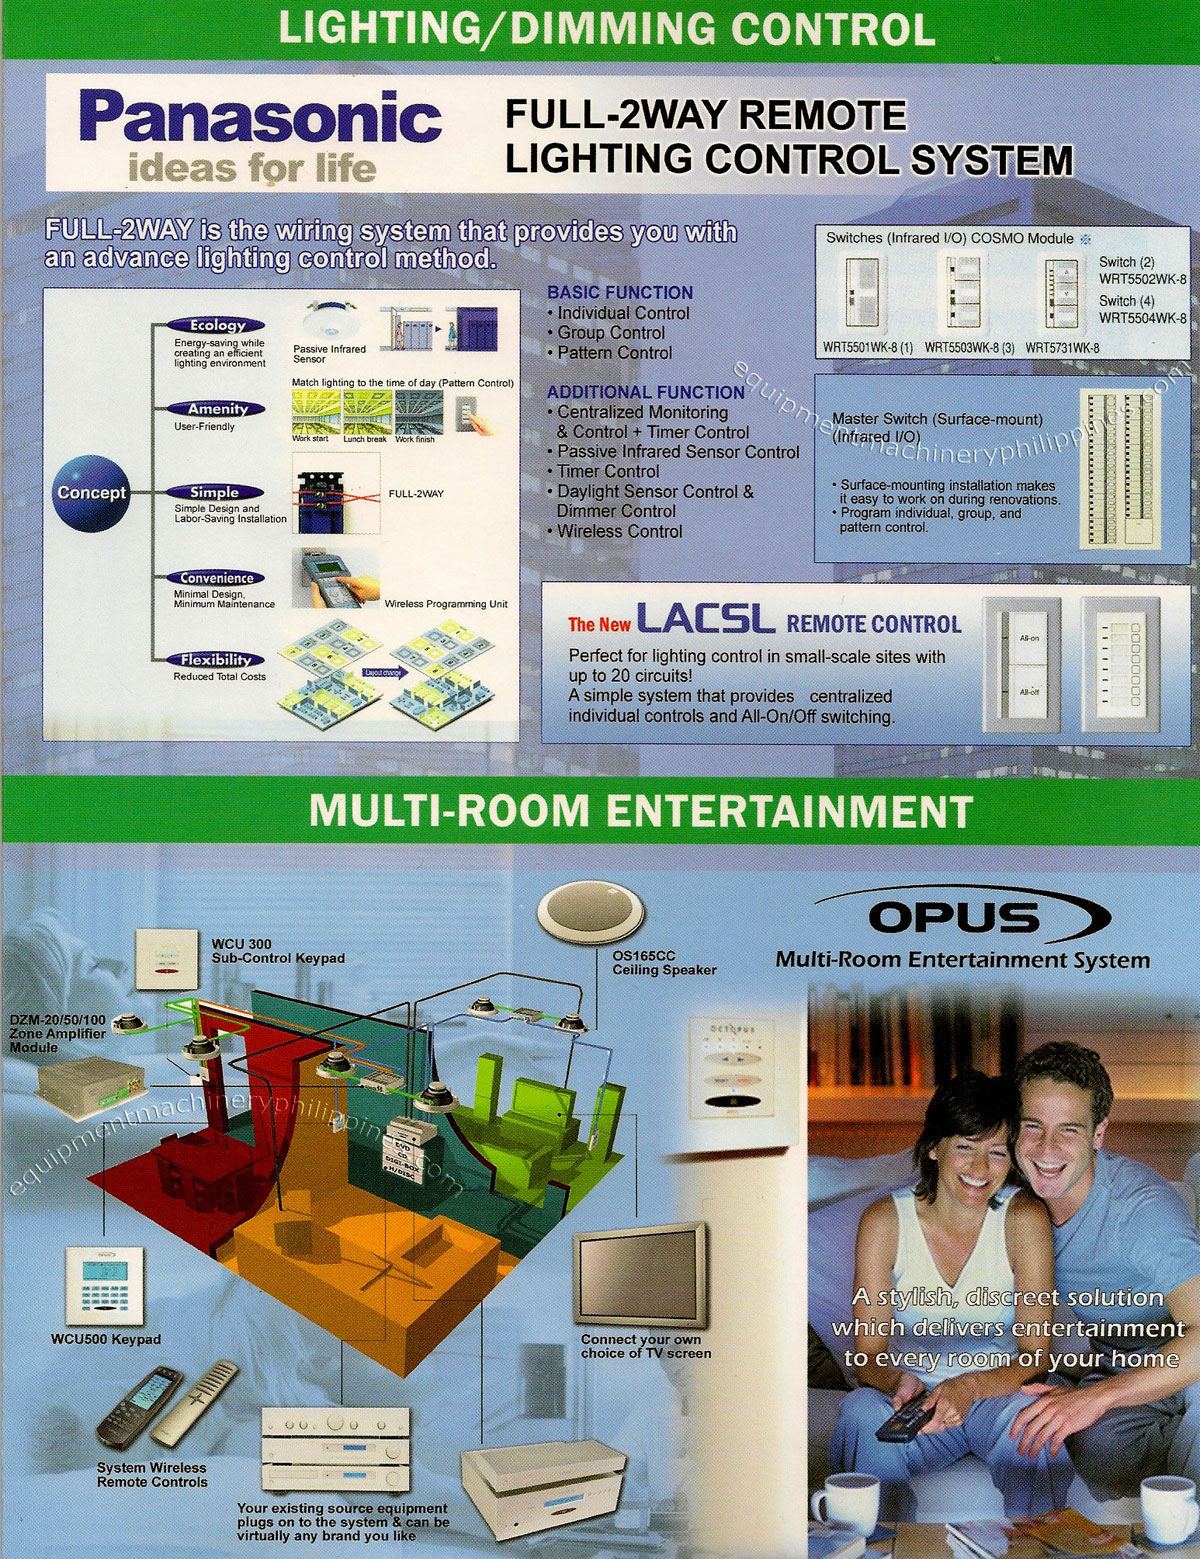 Lighting Dimming Control Panasonic Full 2 Way Remote Wireless Controlled Lightdimmer System Opus Multi Room